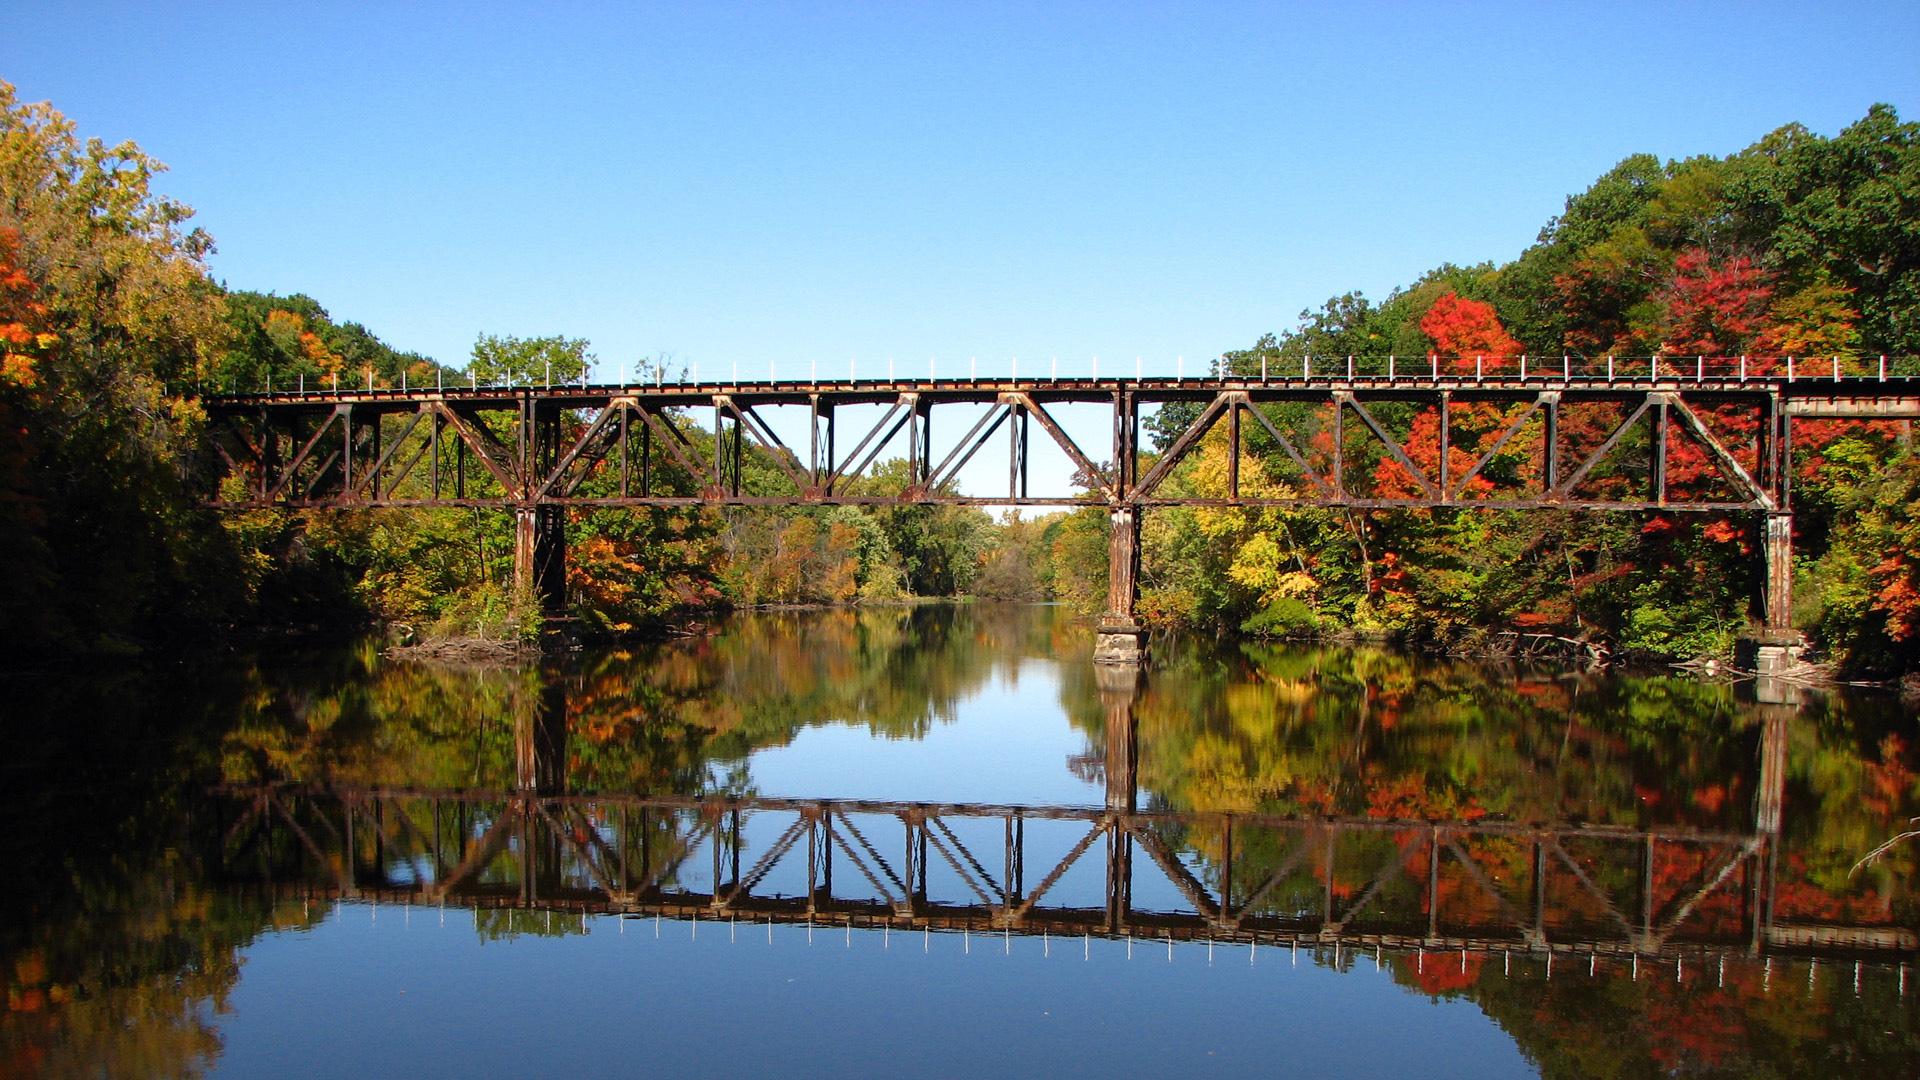 Железная дорога через реку